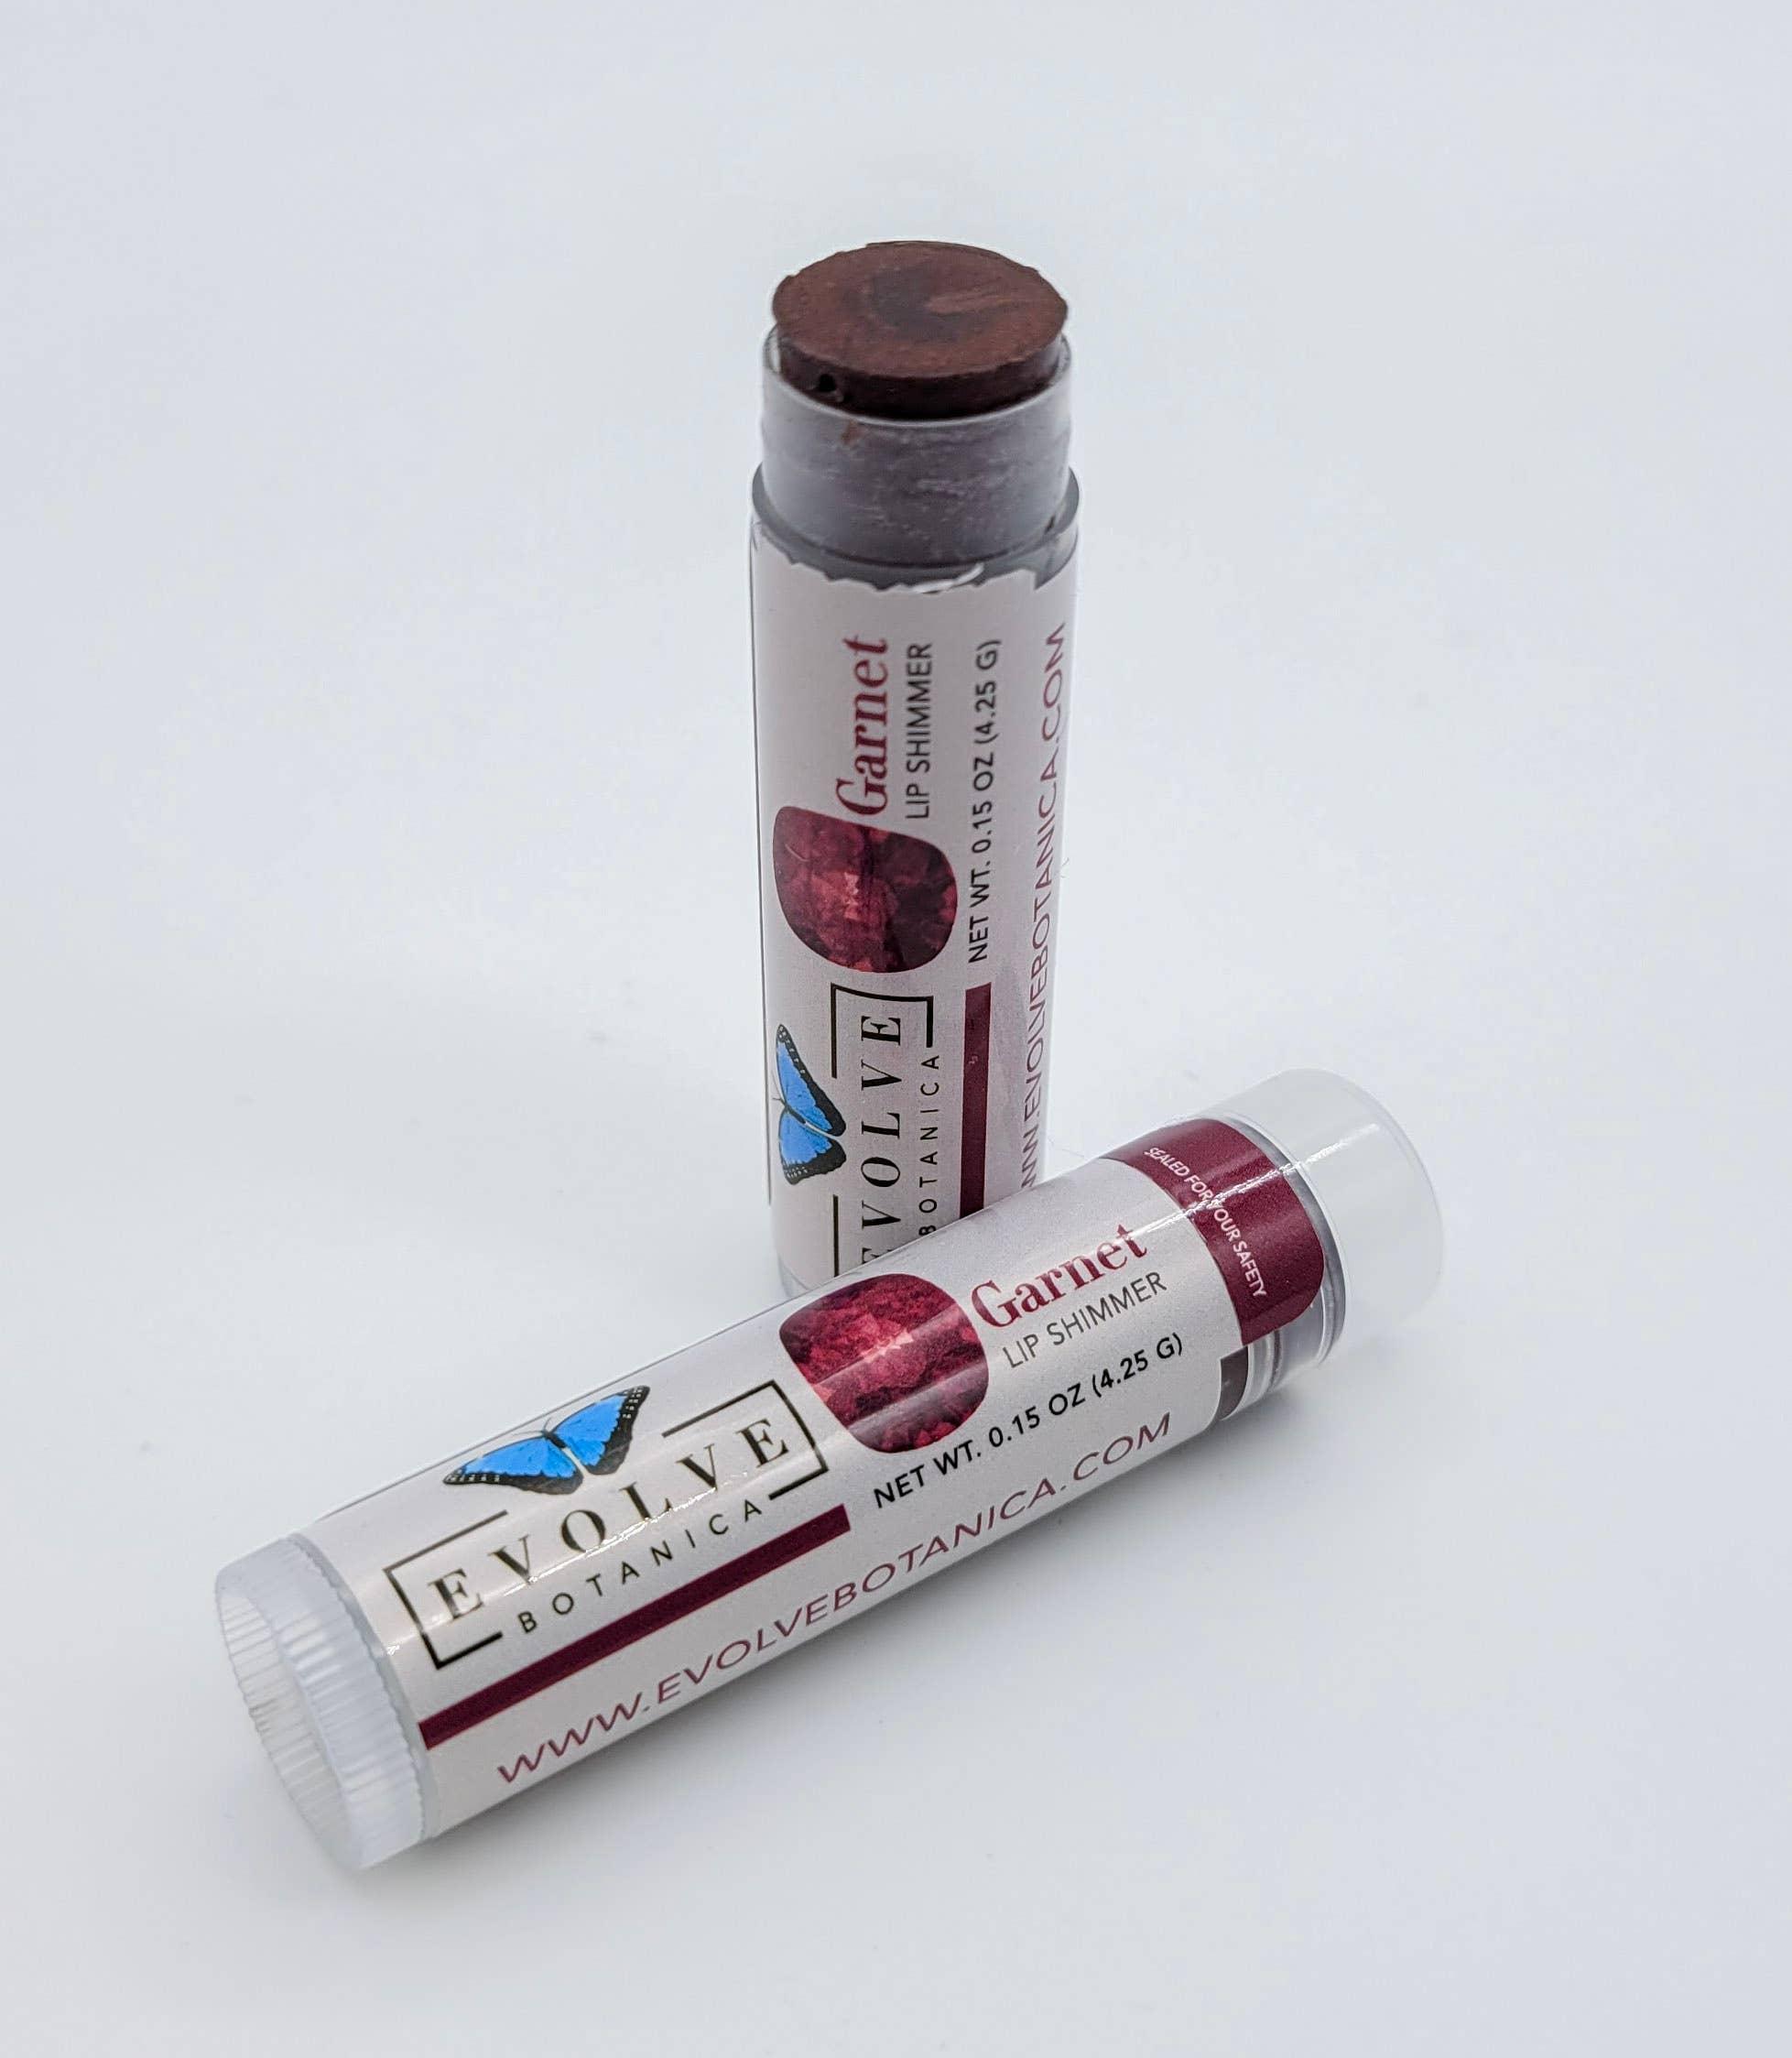 Evolve - Lip Balm - Natural Shimmer Tint - Garnet | Trada Marketplace